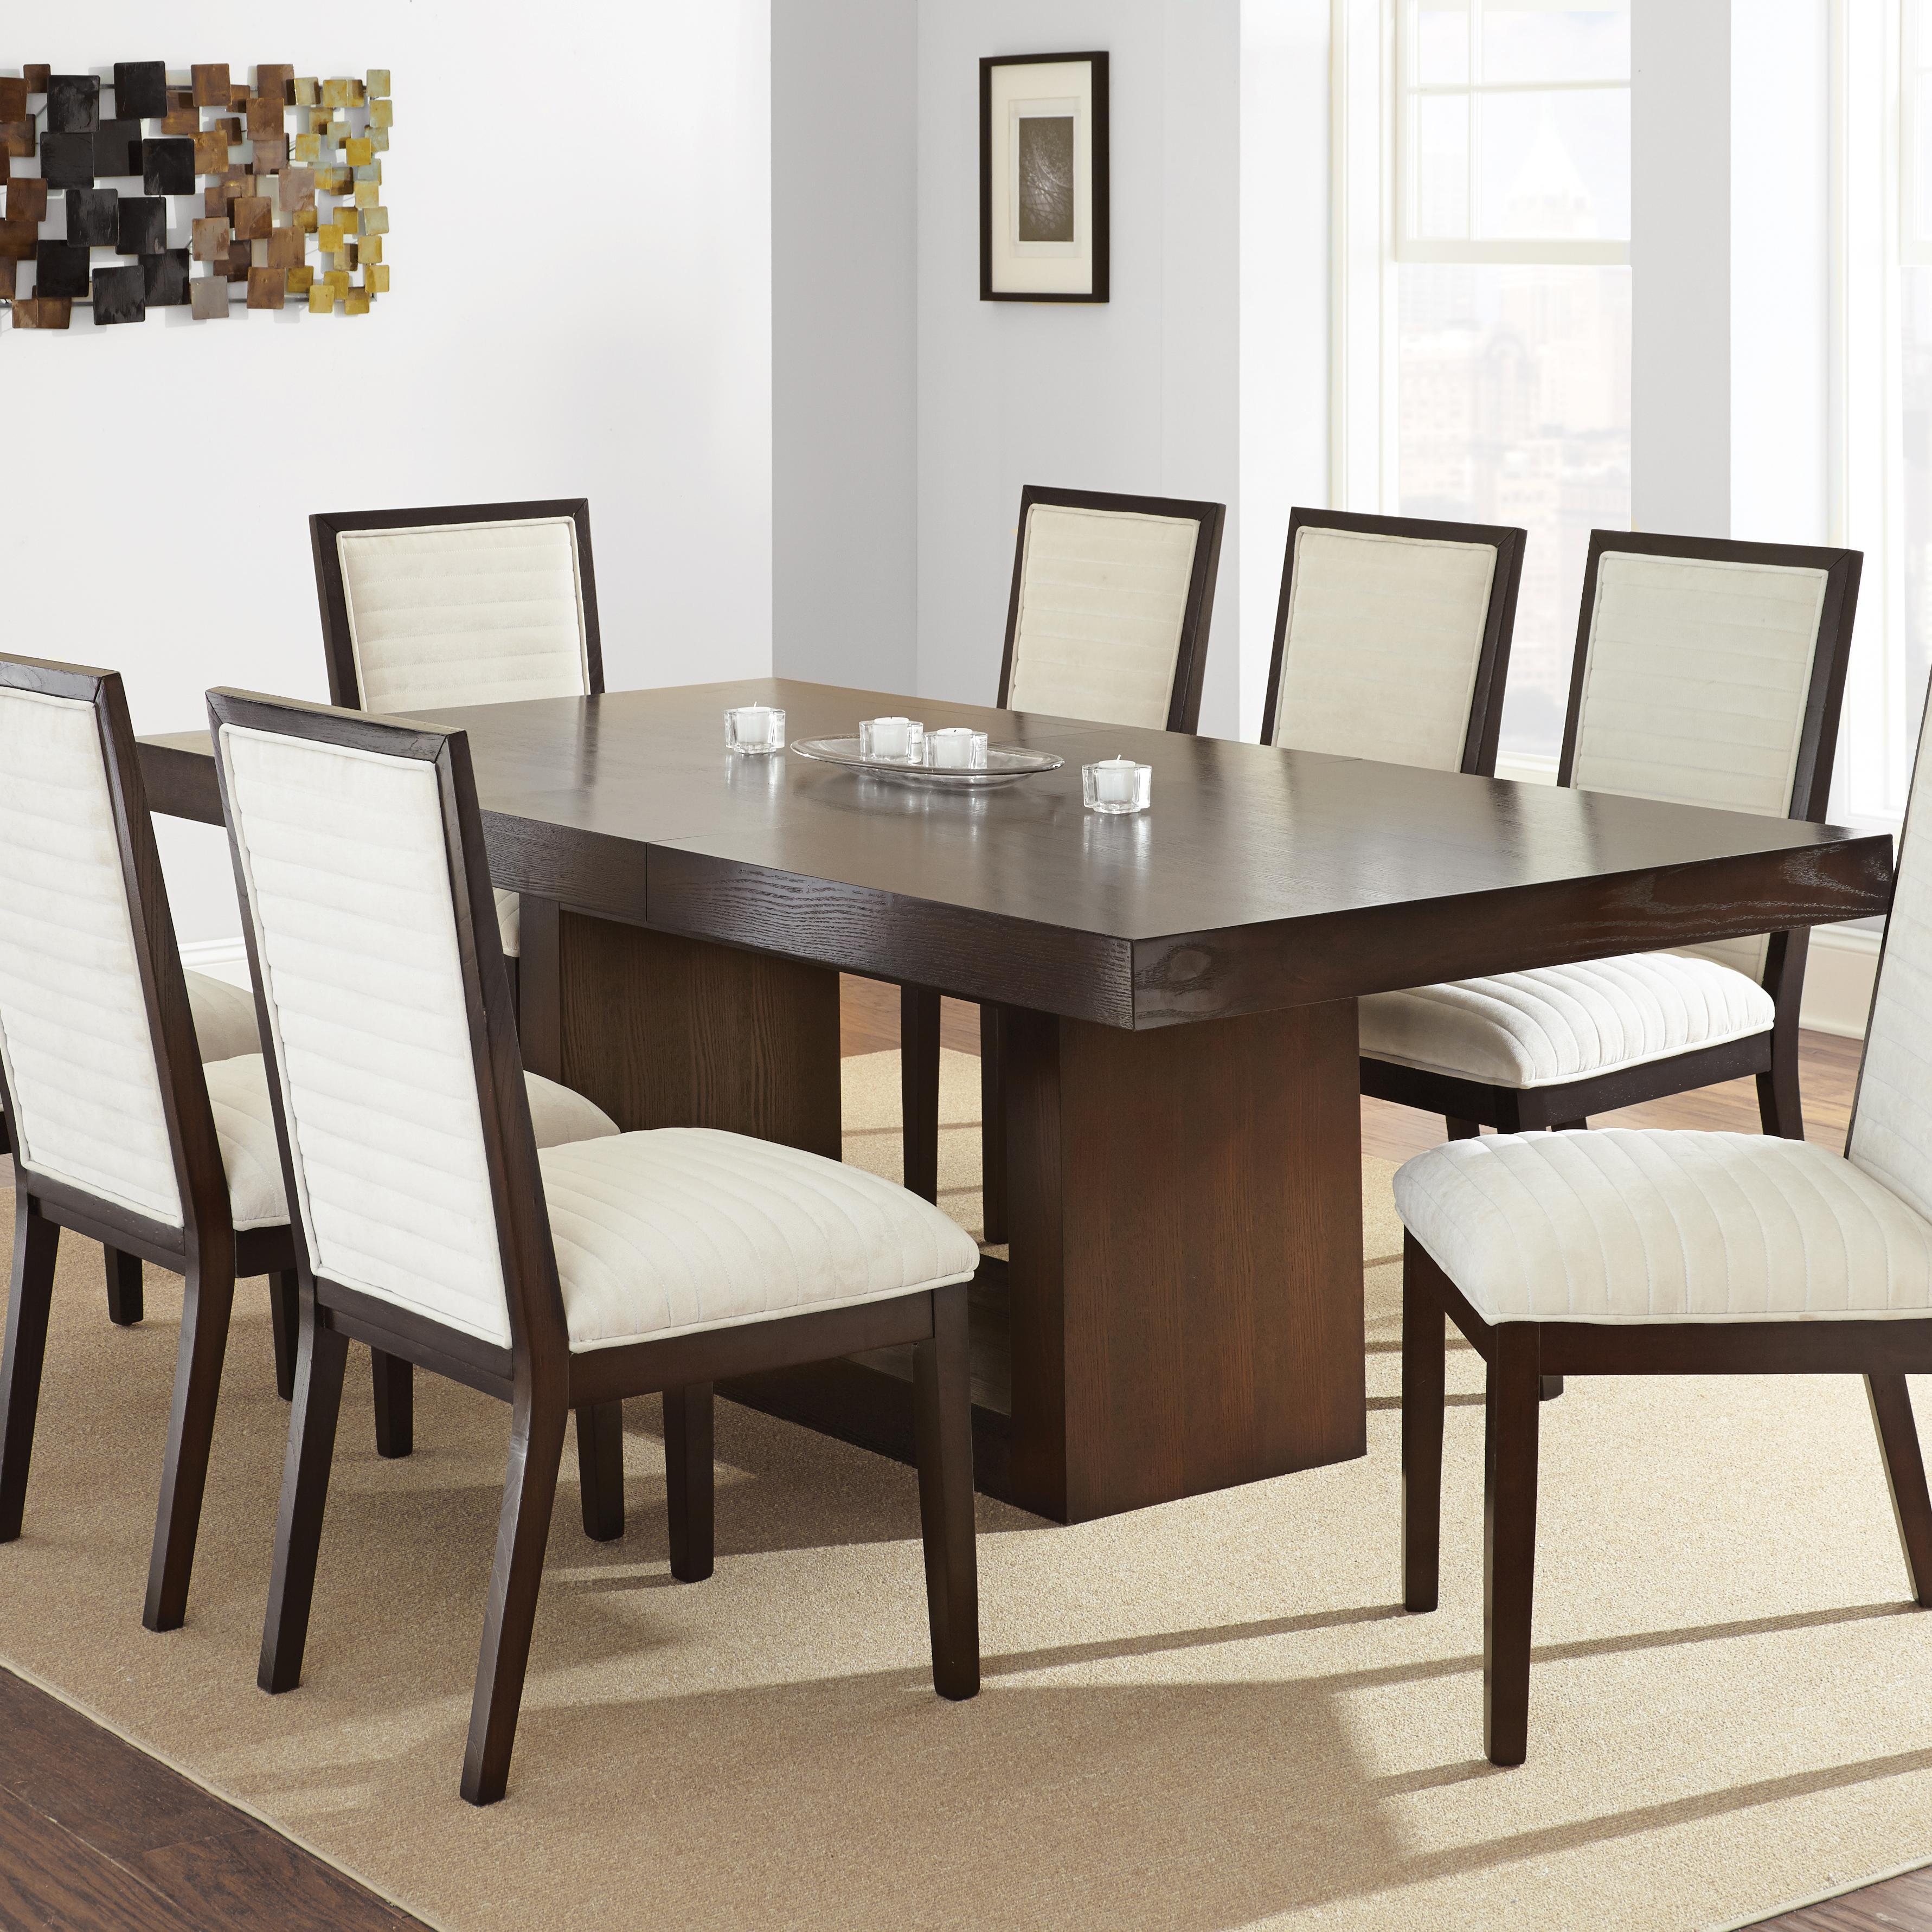 steve silver antonio dining table with contemporary pedestal base olinde 39 s furniture dining. Black Bedroom Furniture Sets. Home Design Ideas